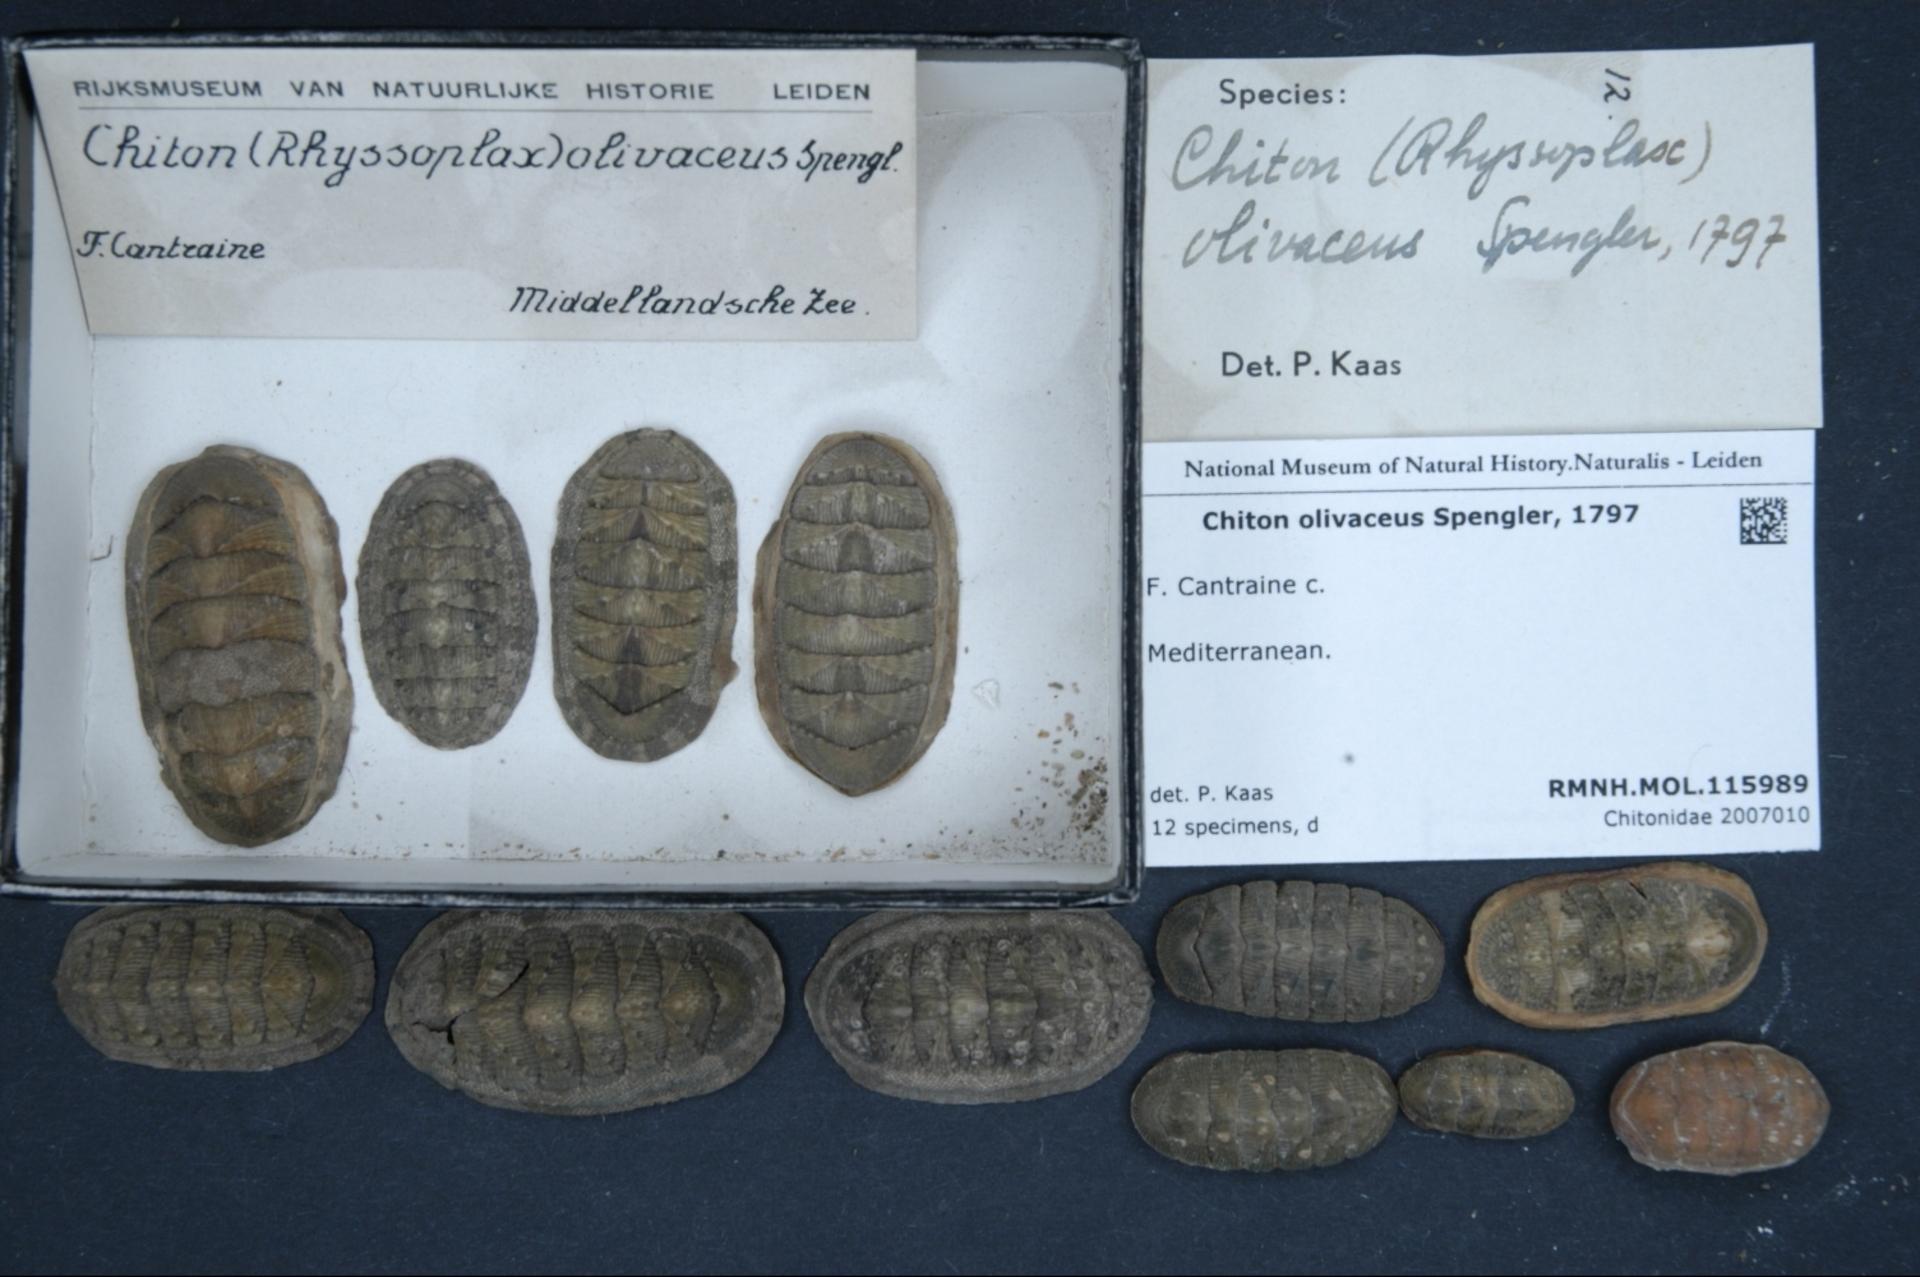 RMNH.MOL.115989 | Chiton olivaceus Spengler, 1797